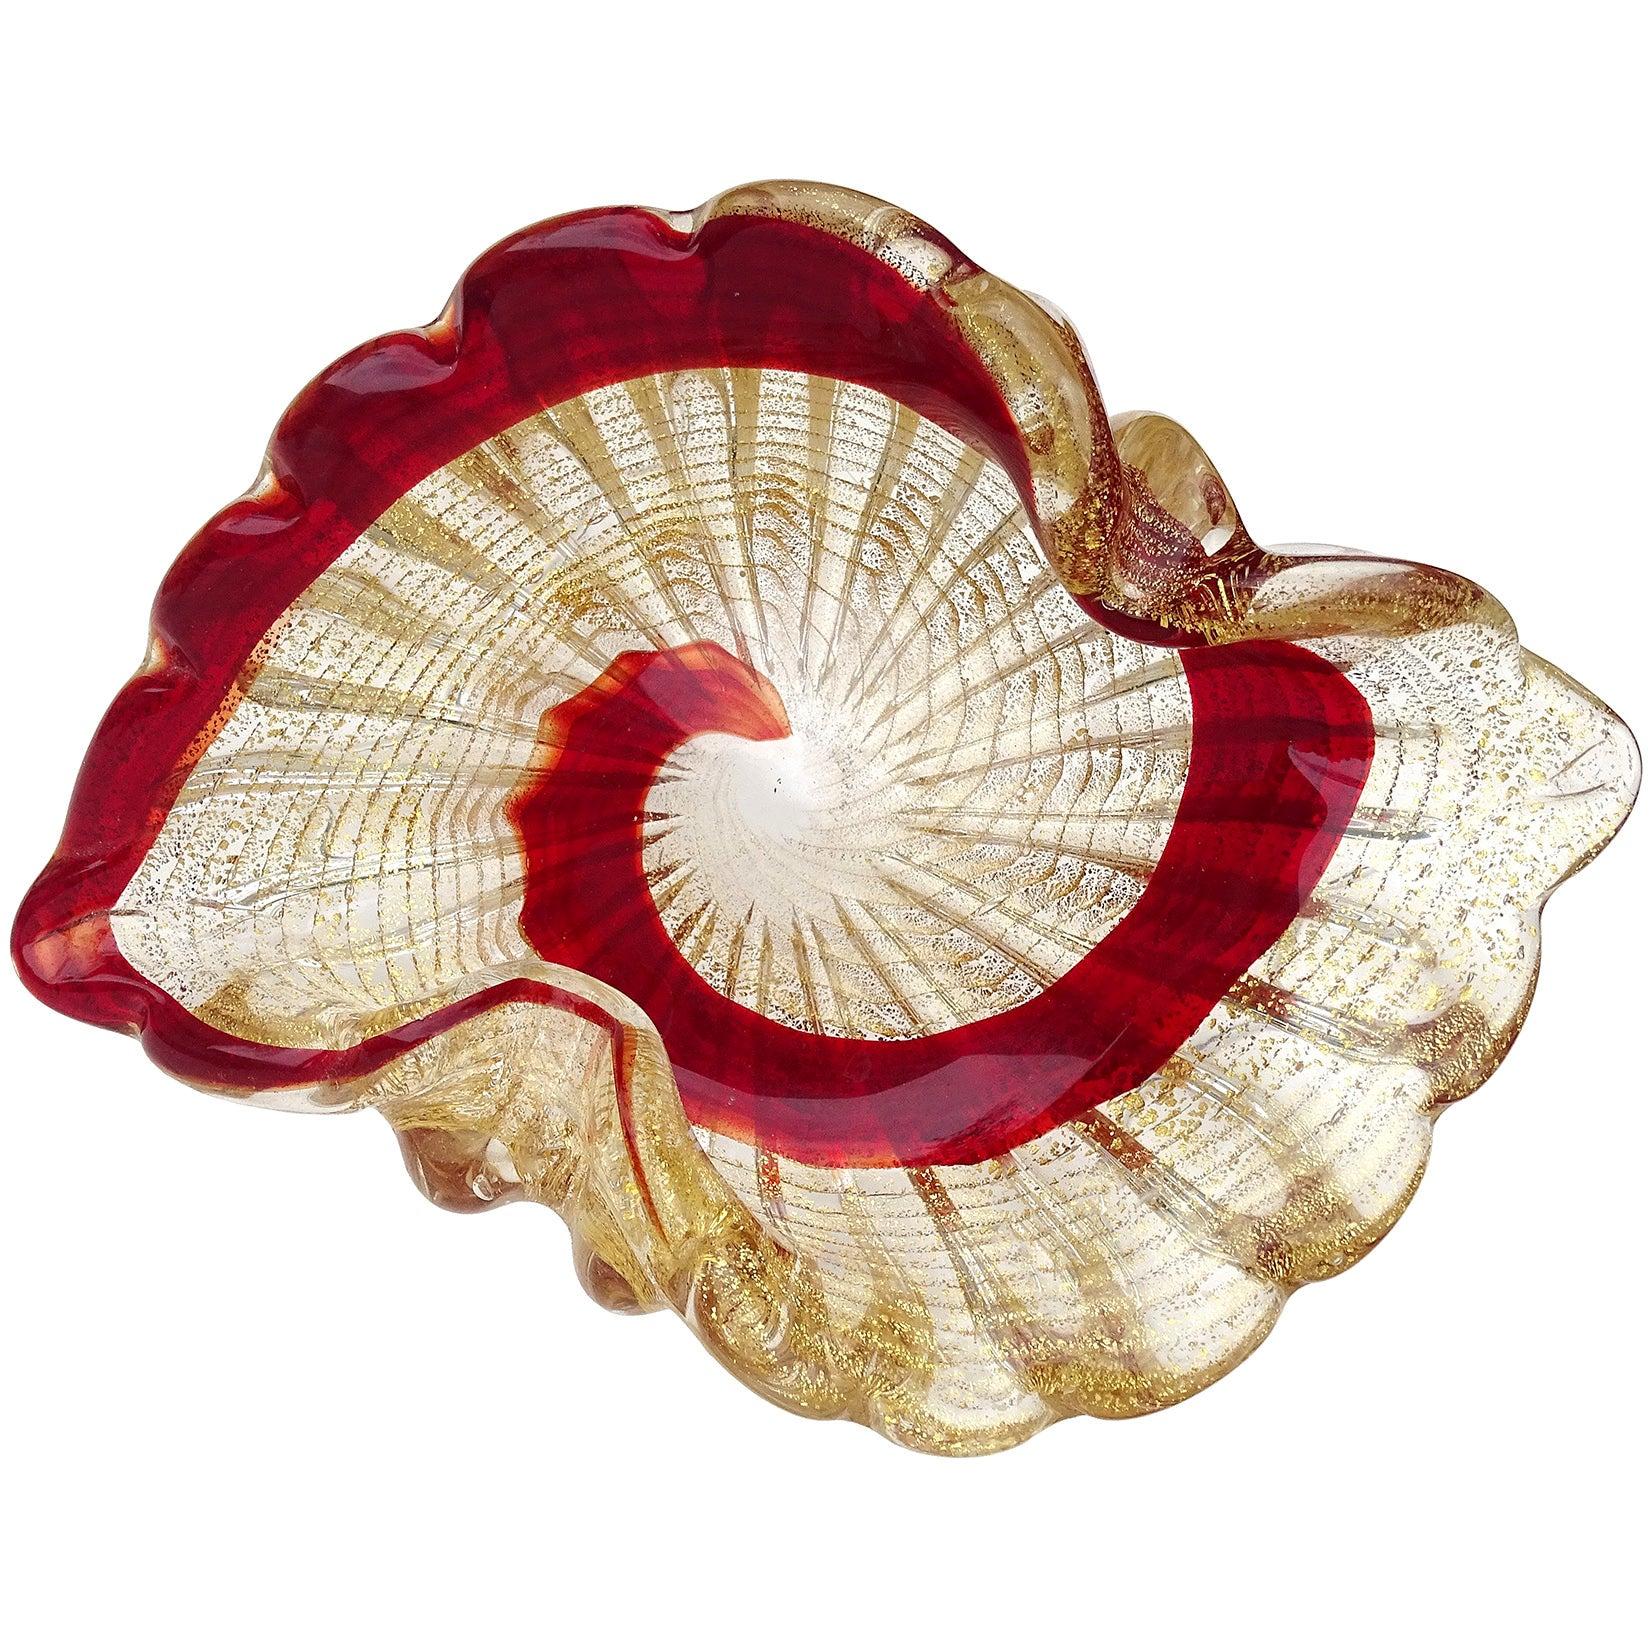 Murano Vintage Red Swirl Paint Stroke Gold Flecks Italian Art Glass Bowl Dish